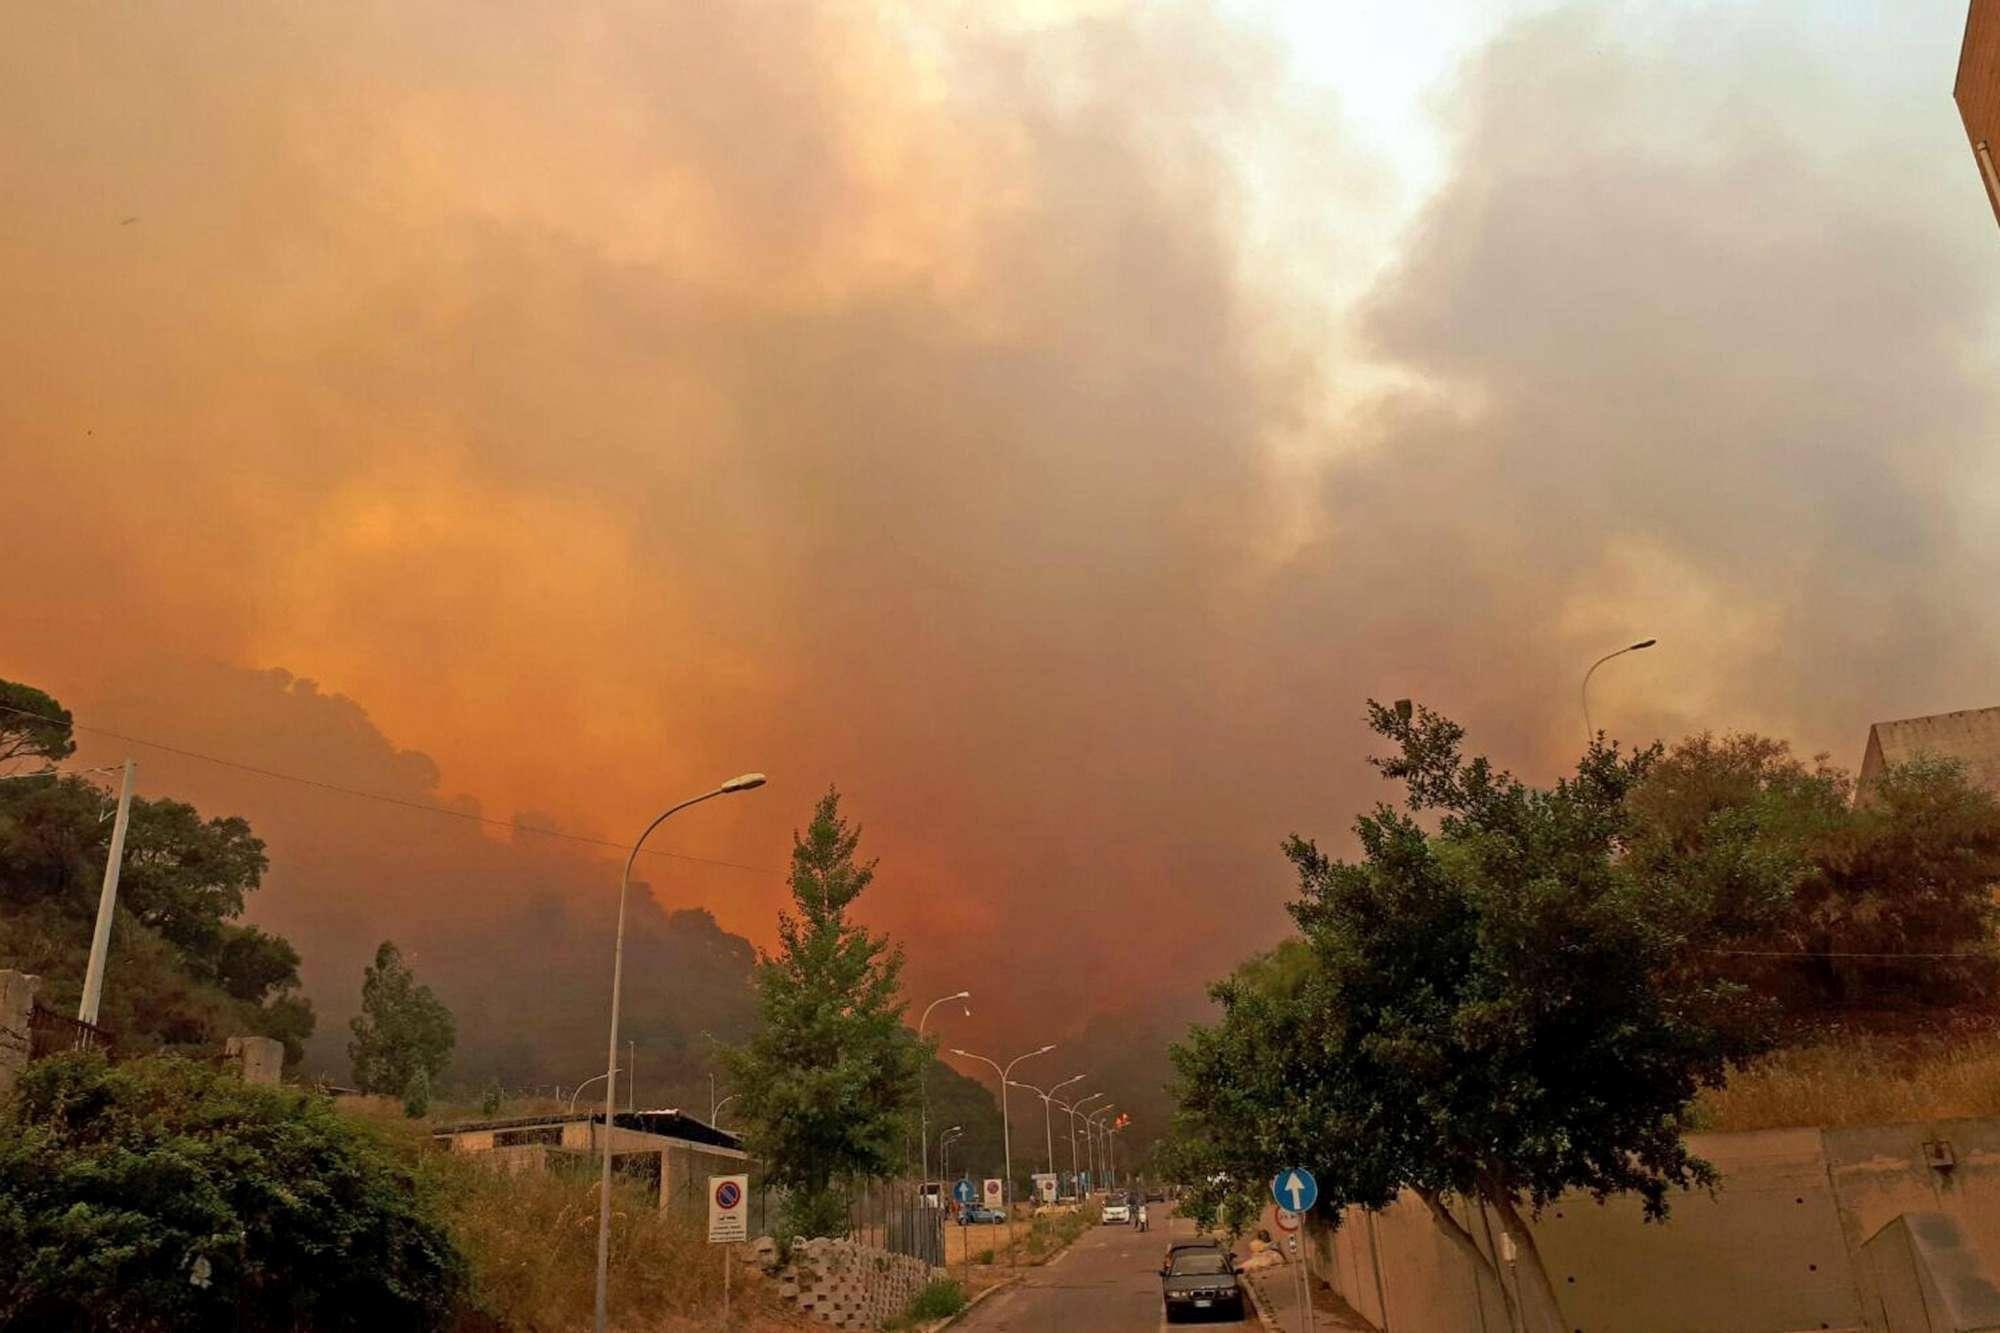 Il Messinese in fiamme: intossicati e famiglie evacuate